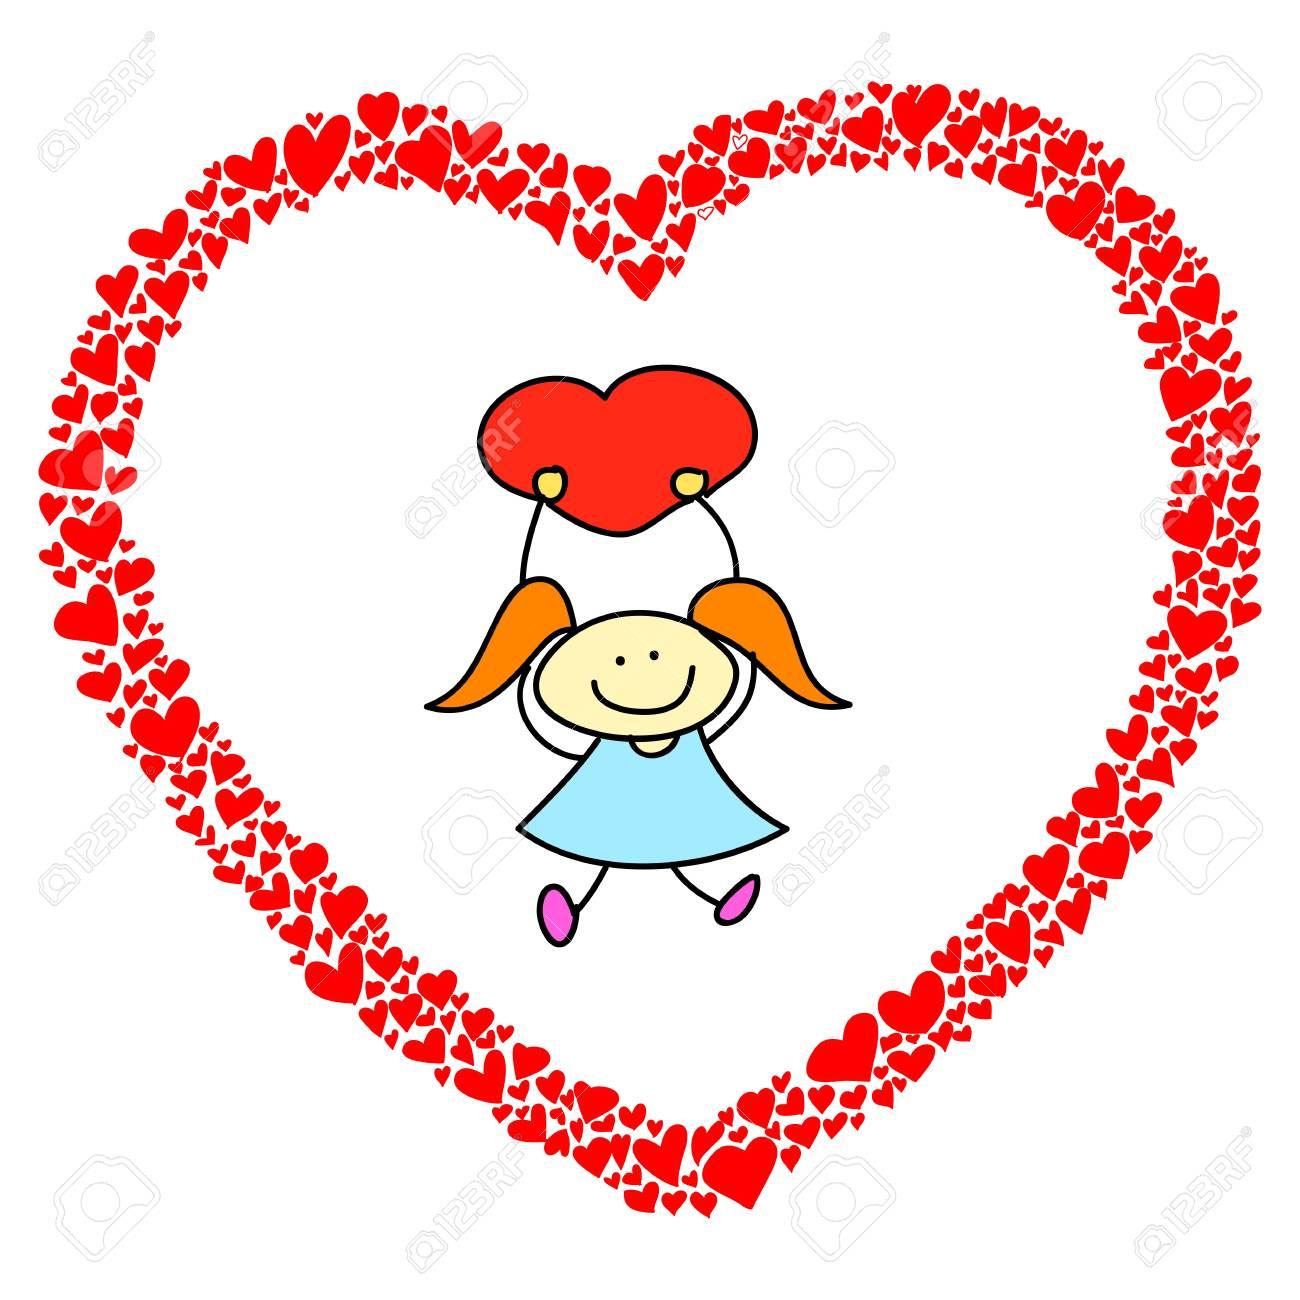 hand-drawn heart sketch design for valentine Stock Vector - 17501352